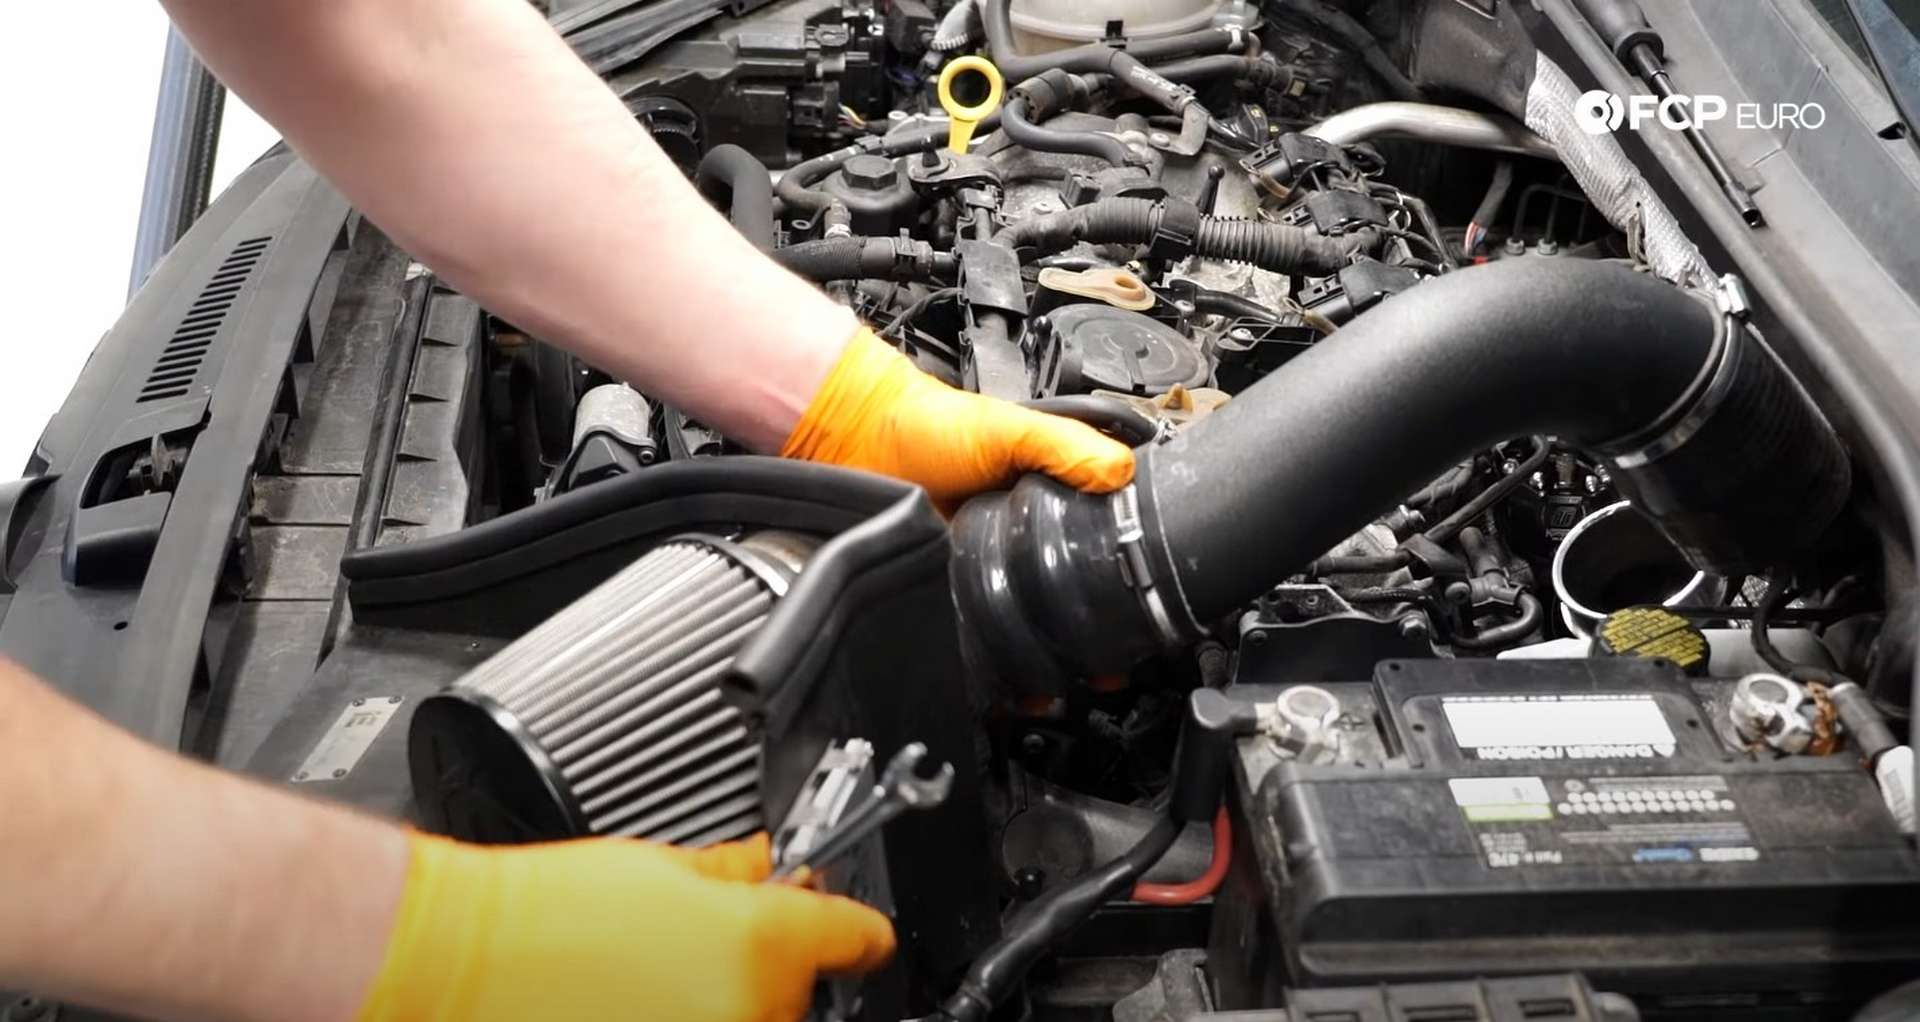 DIY MK7 VW GTI Turbocharger Upgrade removing the intake